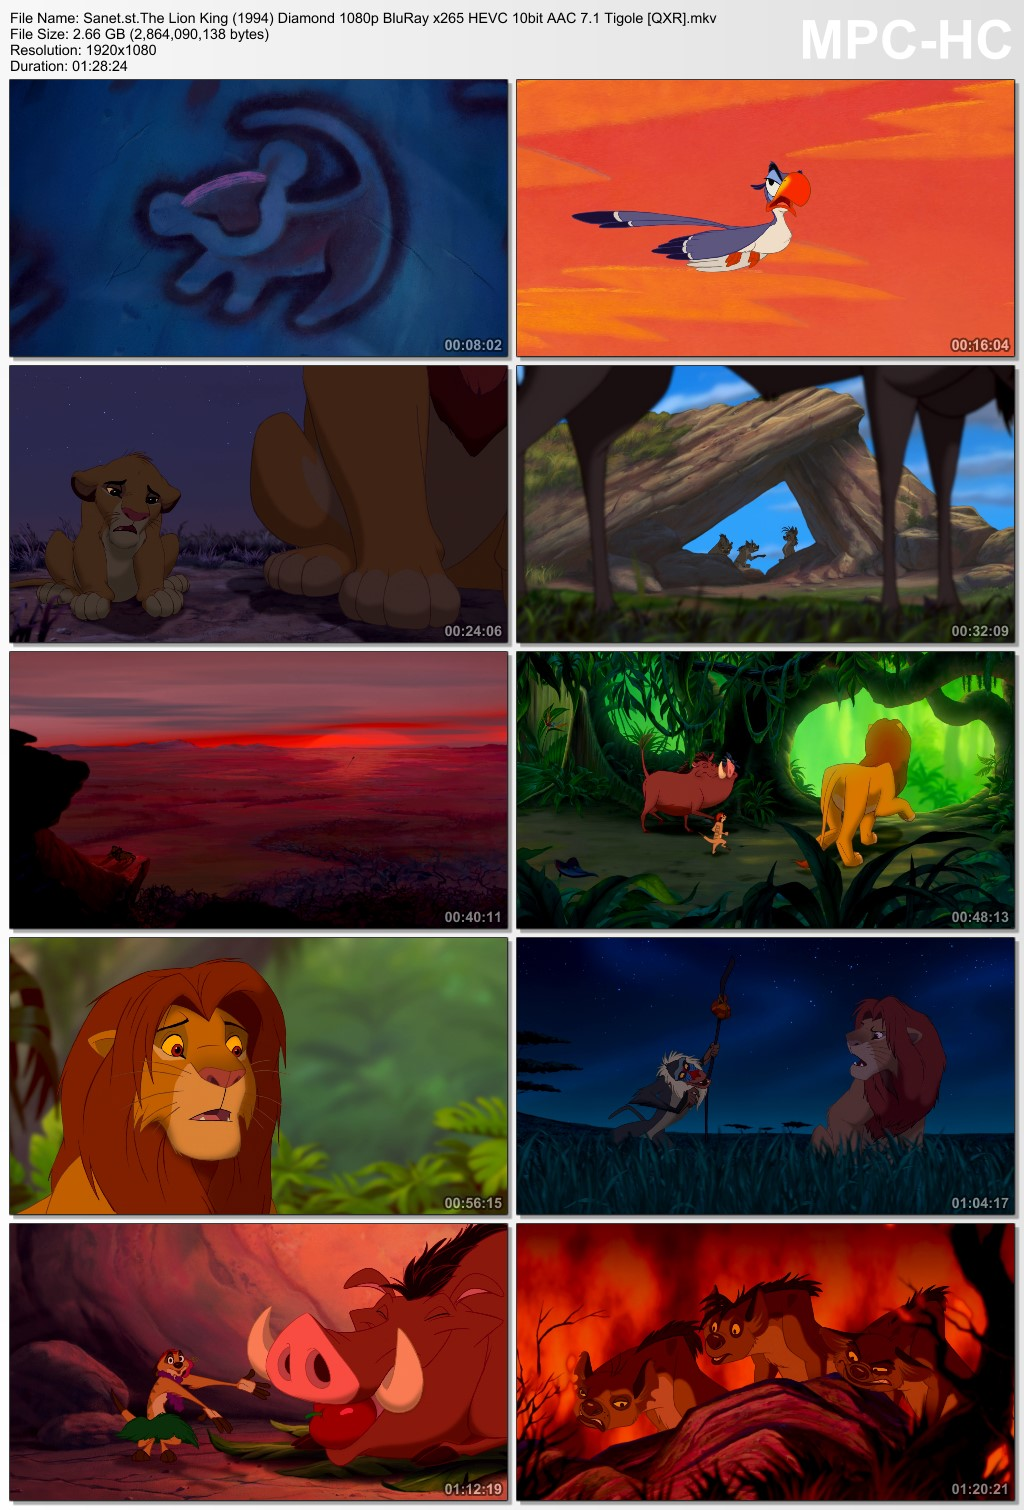 Download The Lion King 1994 Diamond 1080p BluRay x265 HEVC 10bit AAC